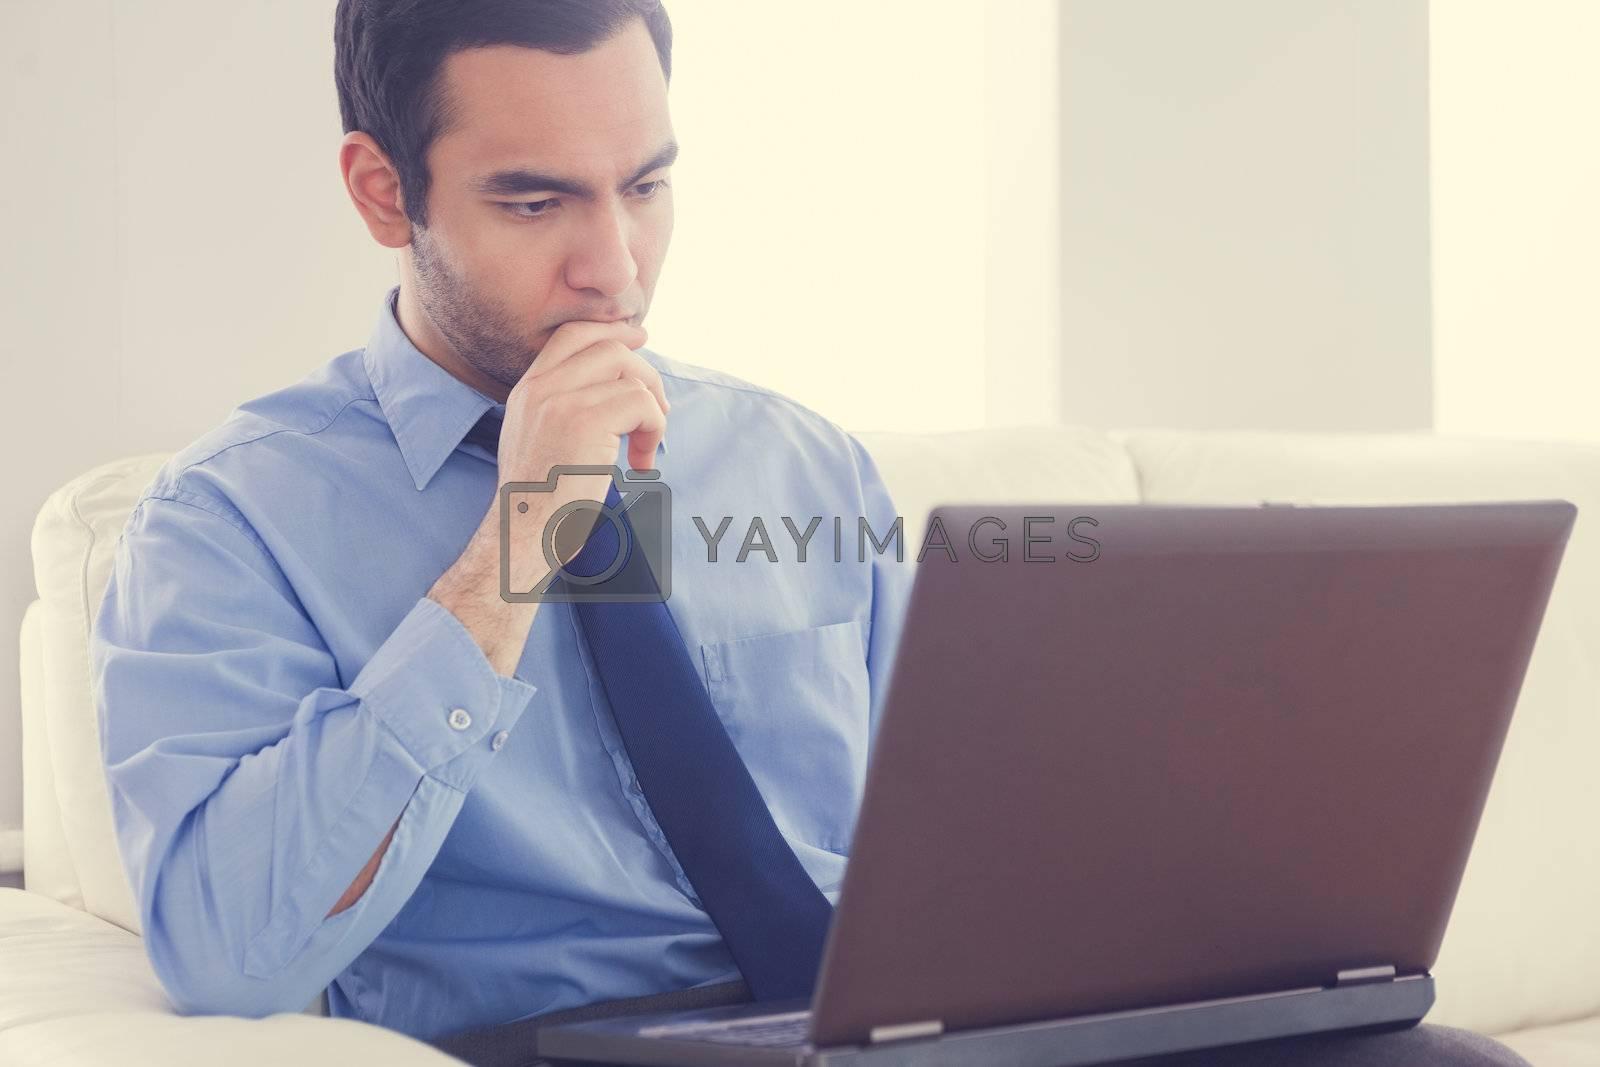 Stressed man using a laptop sitting on a sofa by Wavebreakmedia